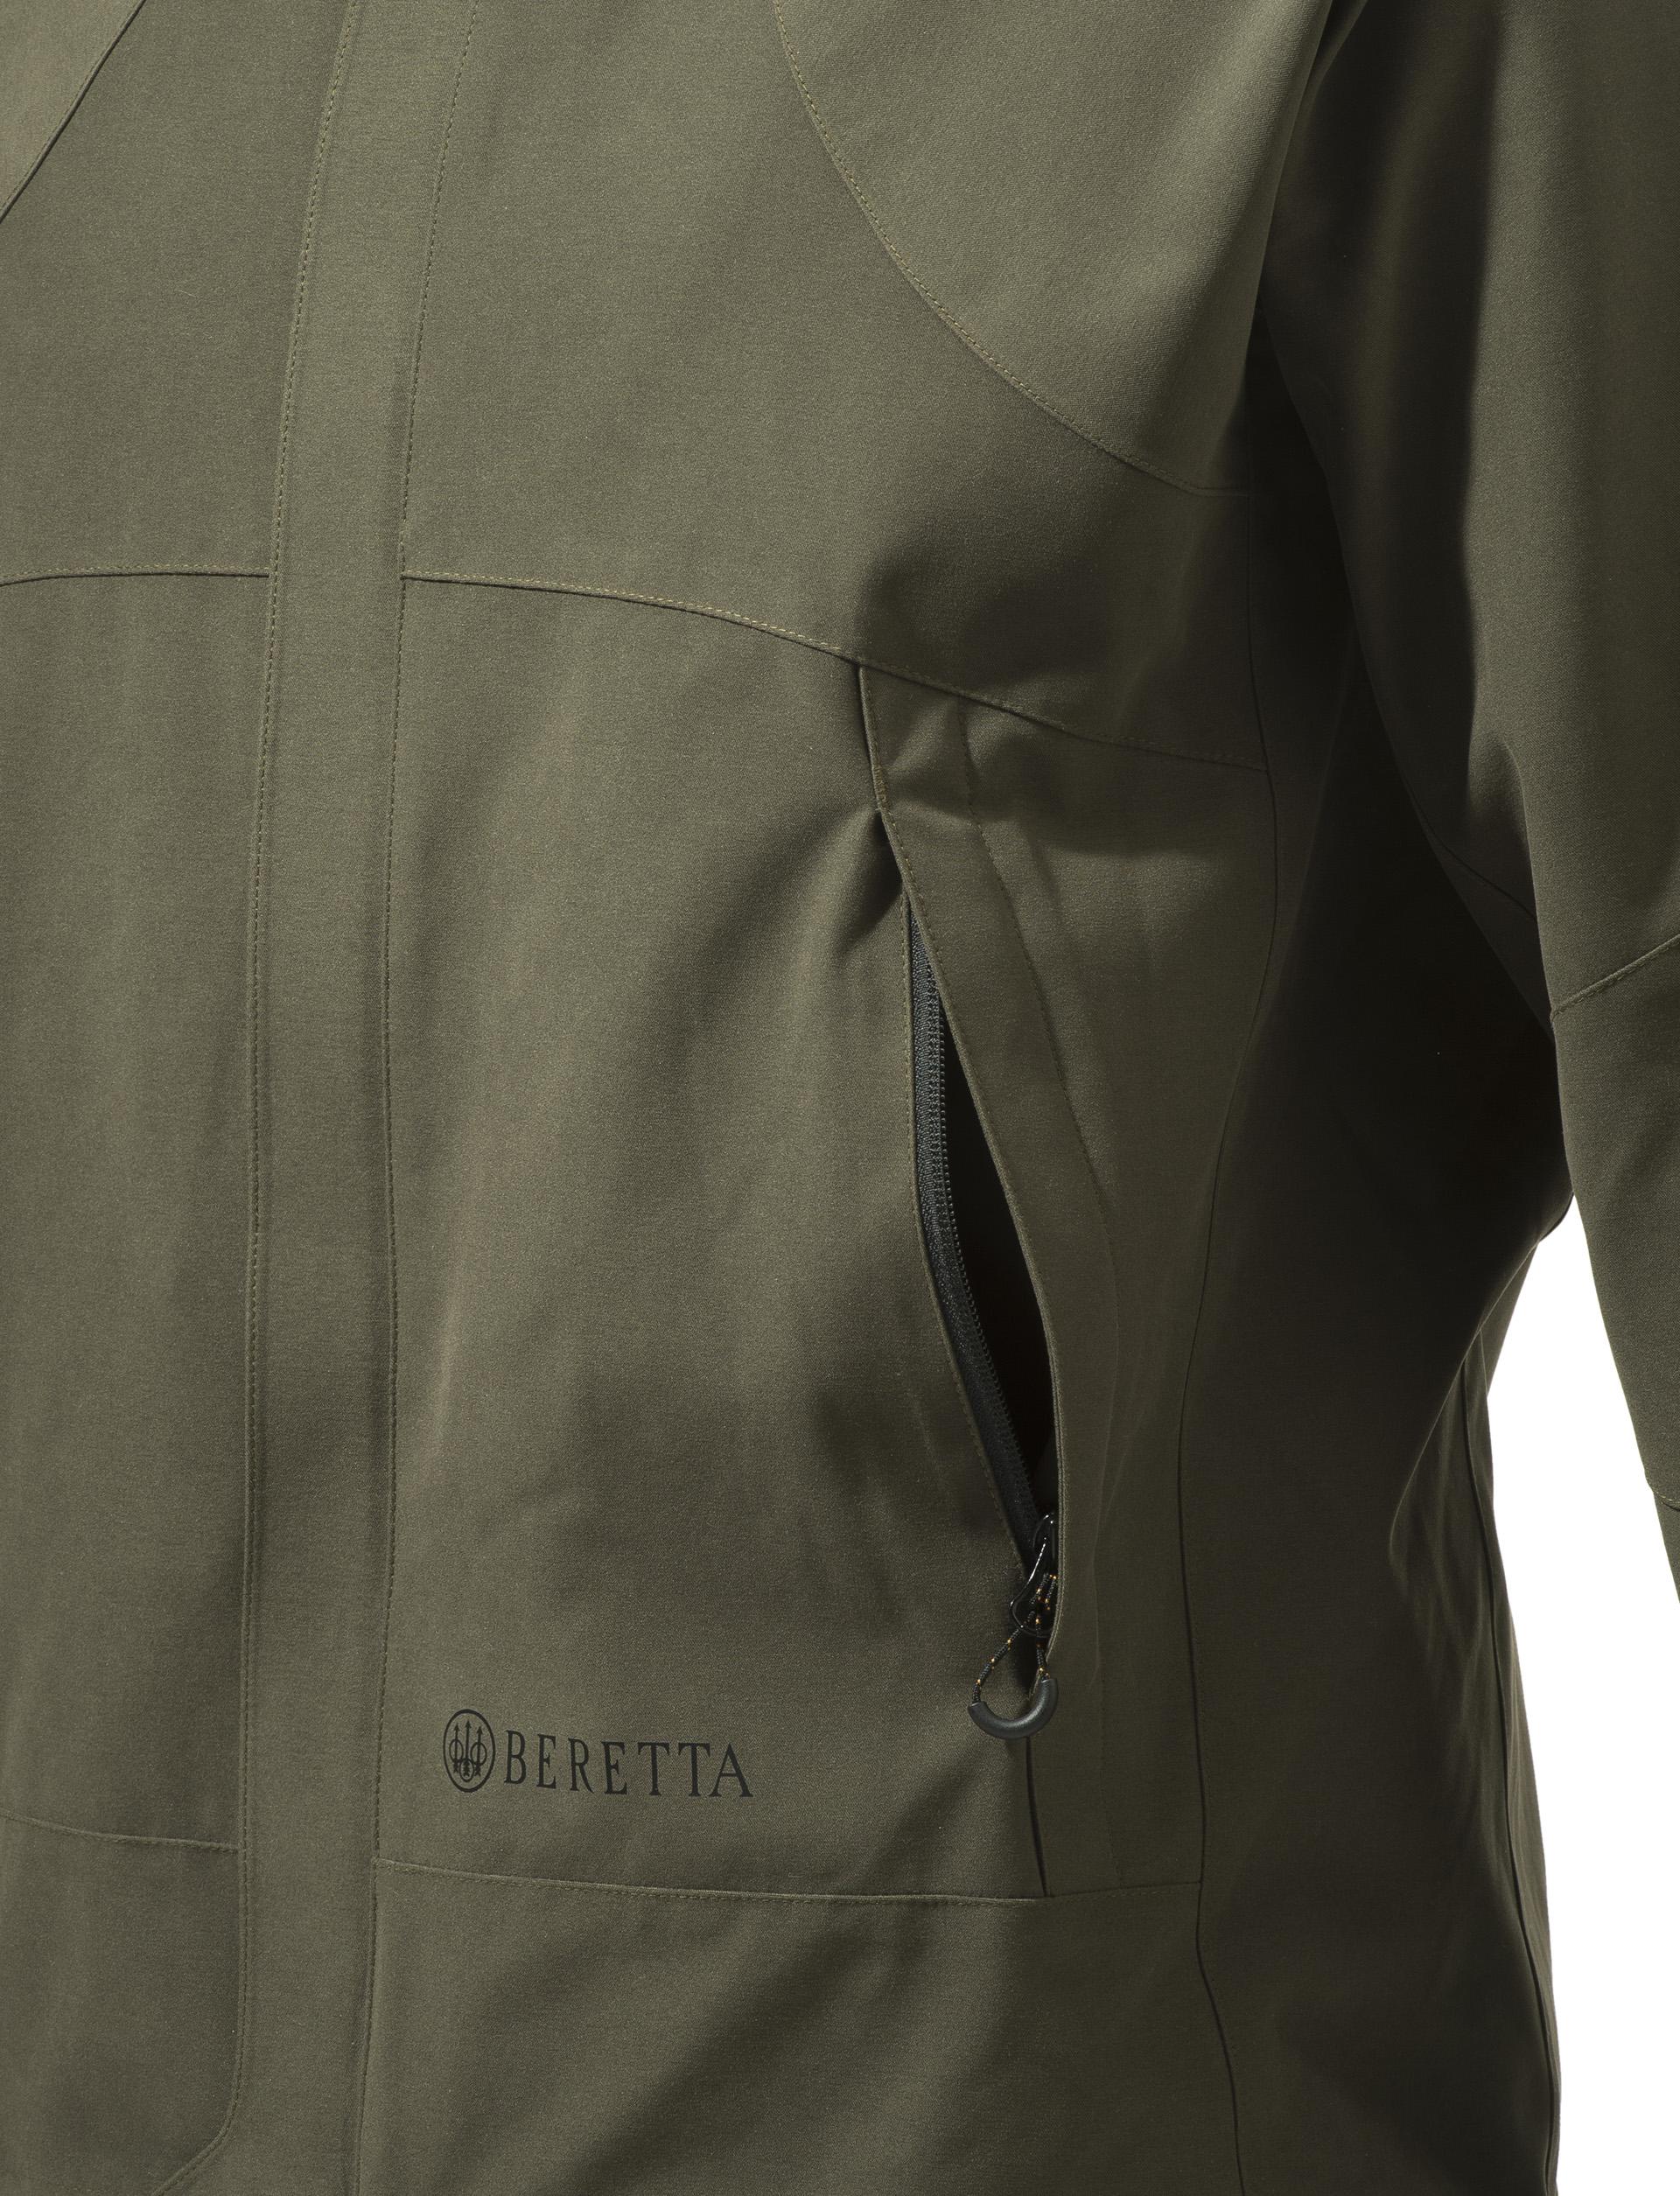 GU972022950715 Beretta Lite Shell Jacket Green Pocket